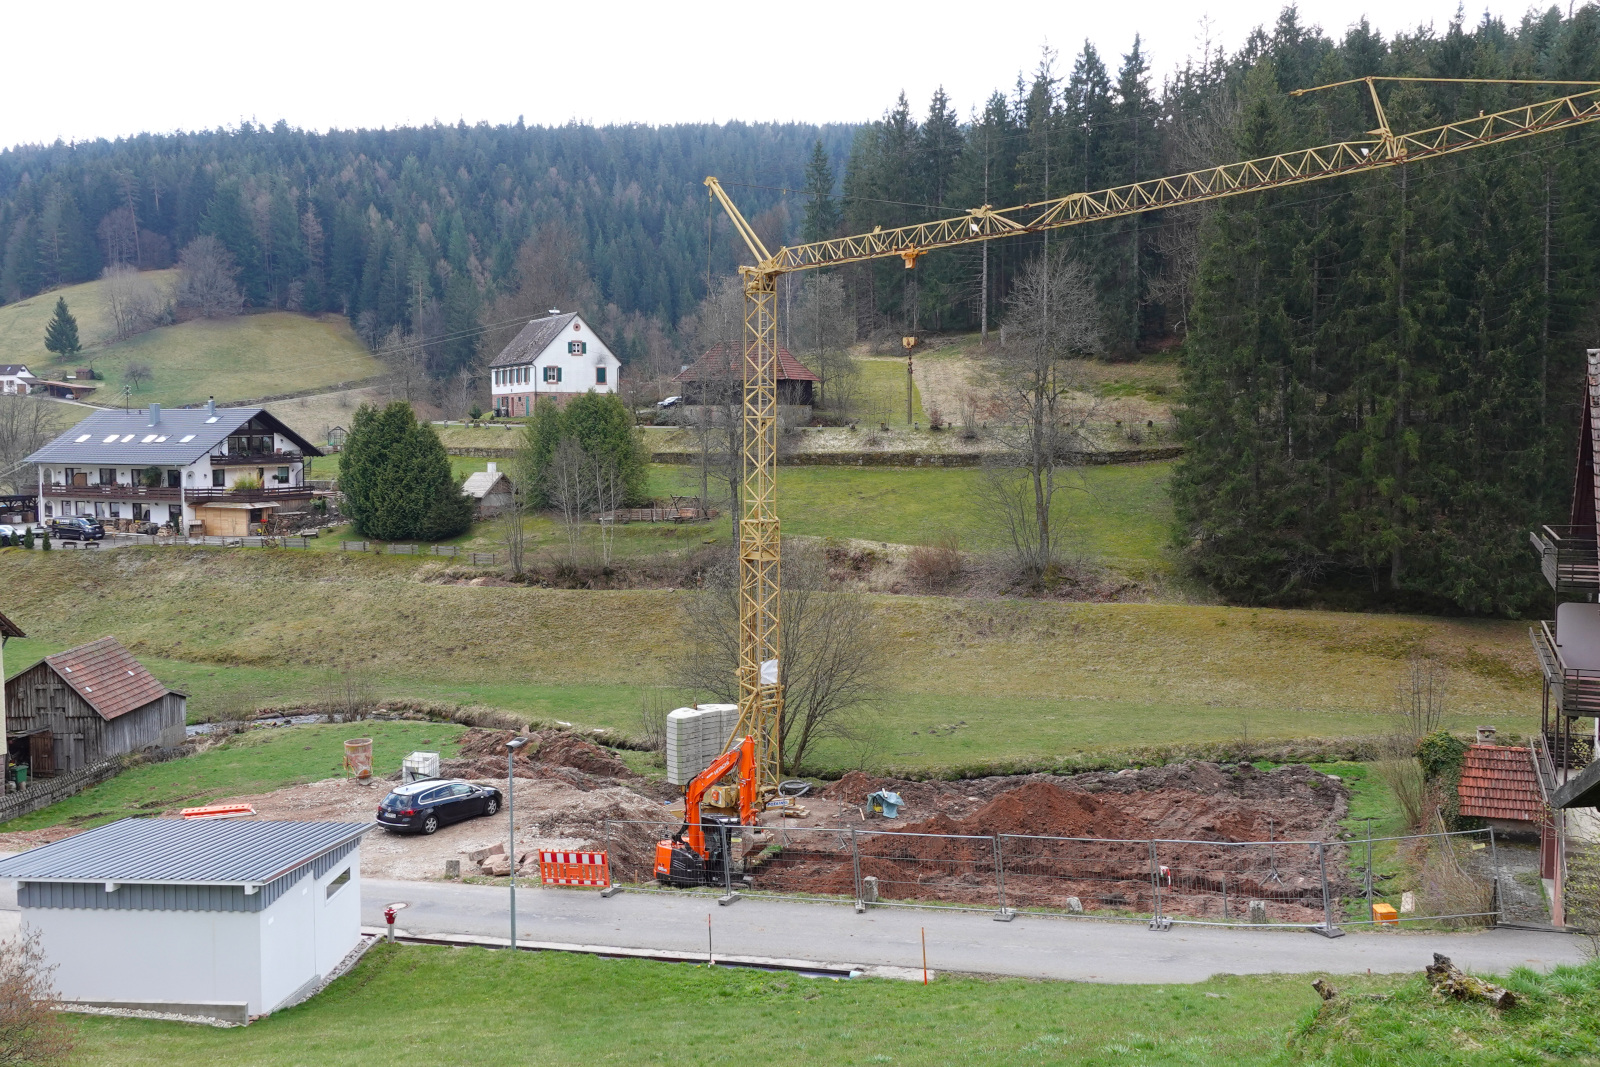 Baustelle in Enzklösterle - Gompelscheuer.